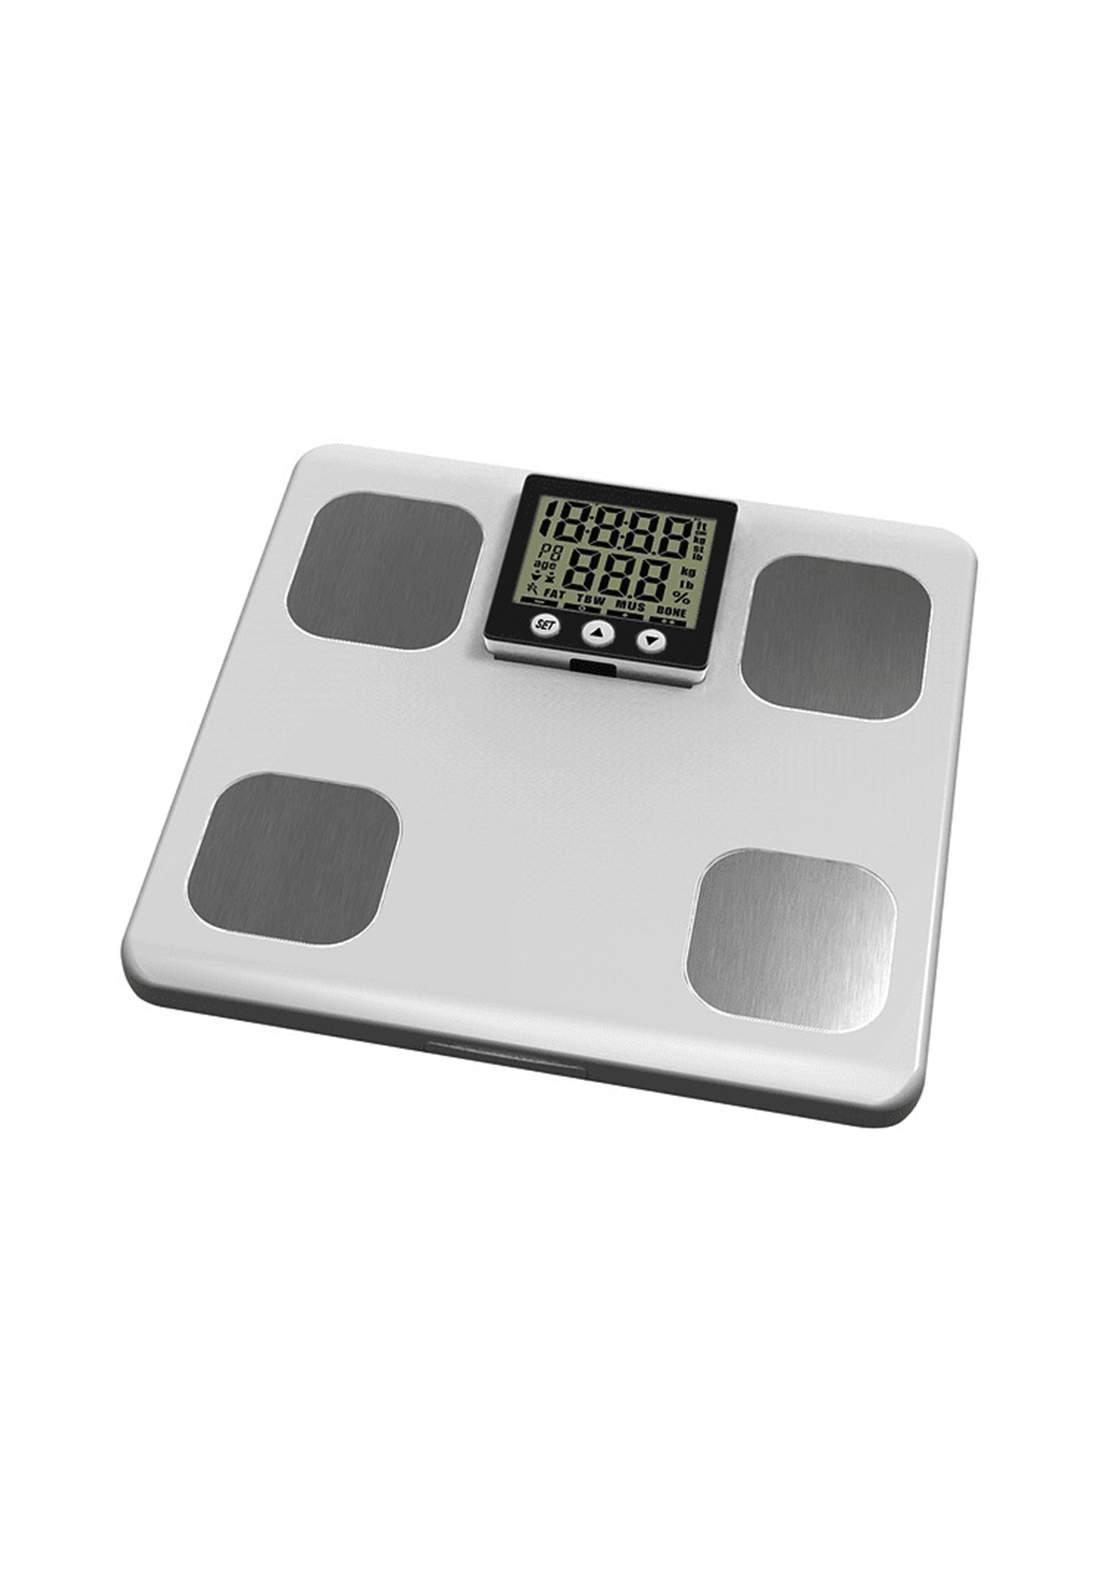 Electronic Body Fat Scale مقياس دهون الجسم الإلكتروني